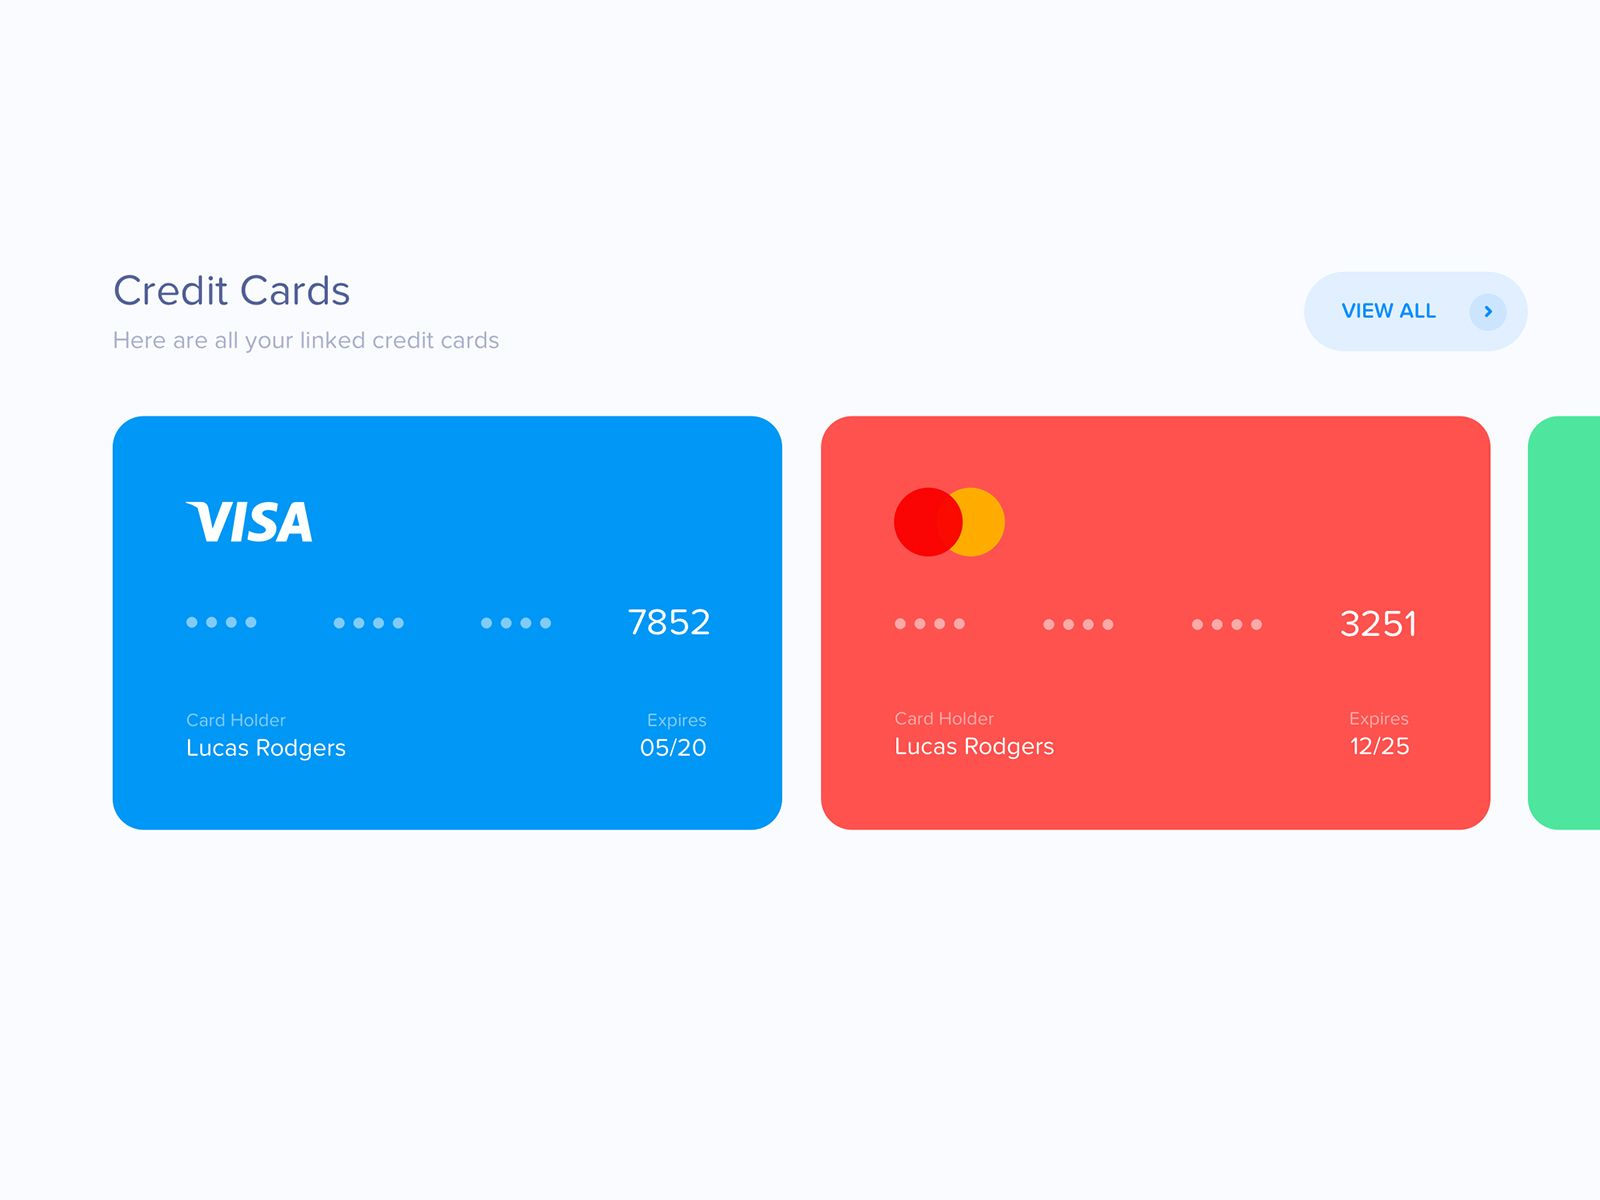 Credit cards credit card design cards visa card